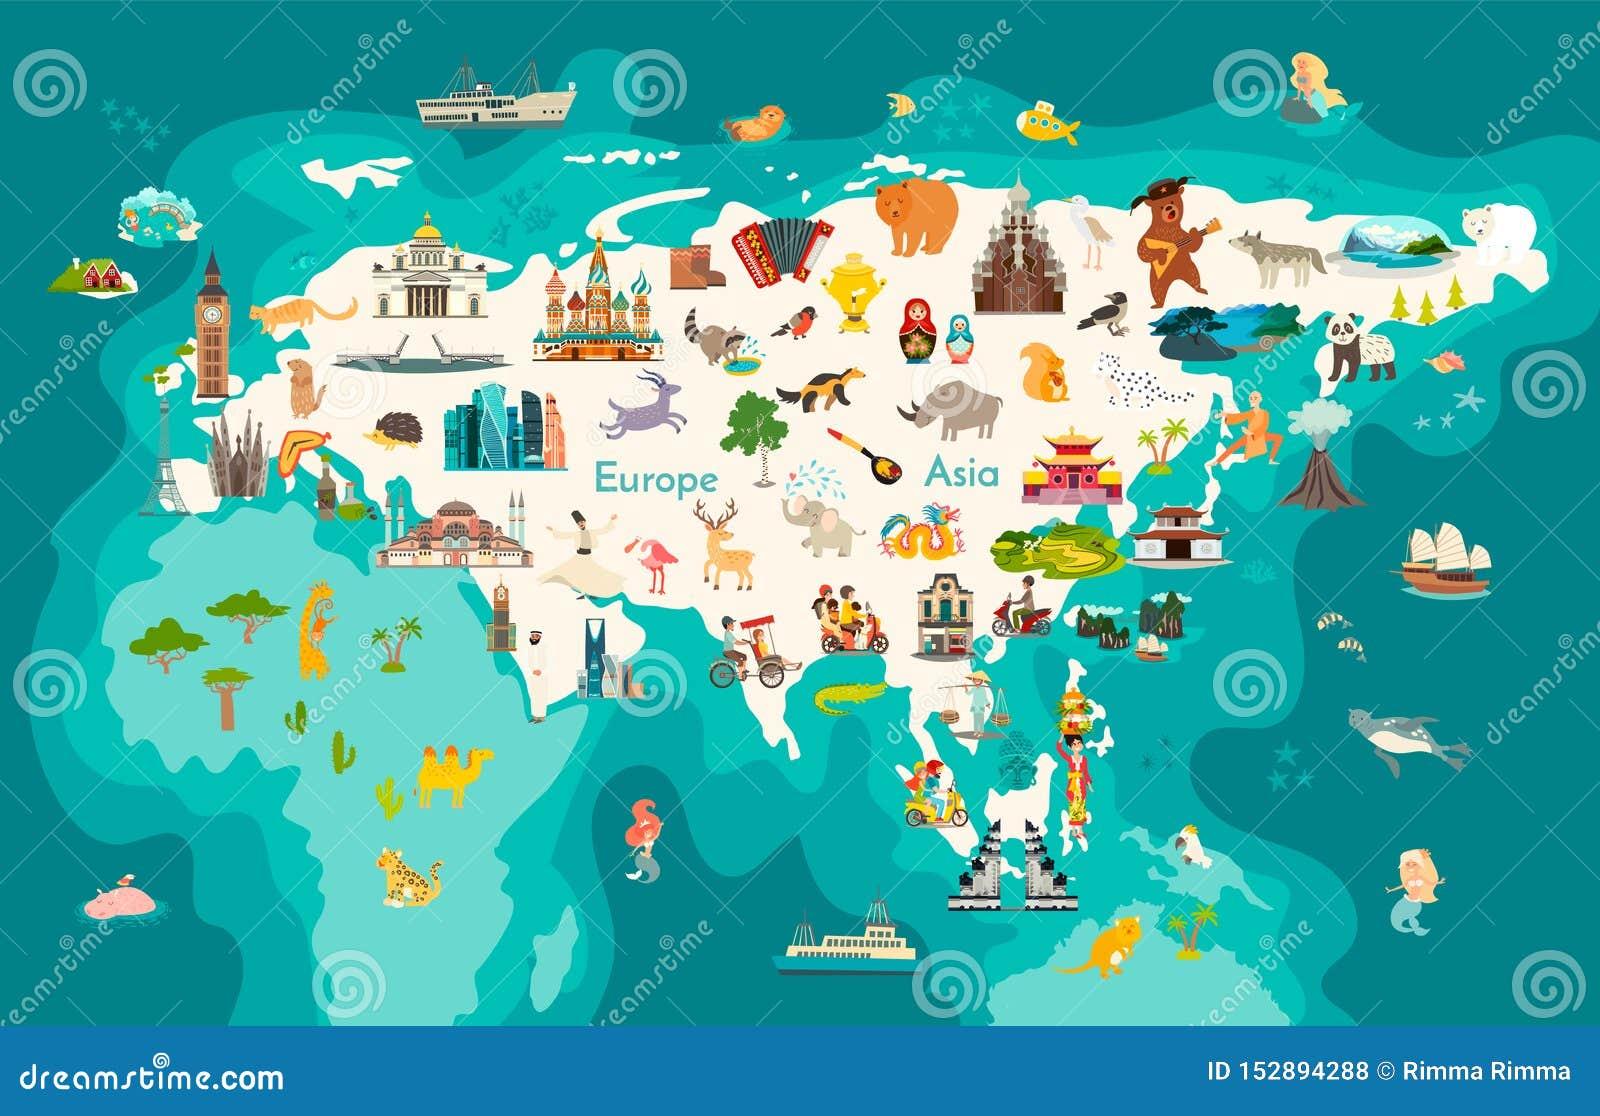 Eurasia Continent, World Map With Landmarks Vector Cartoon ...